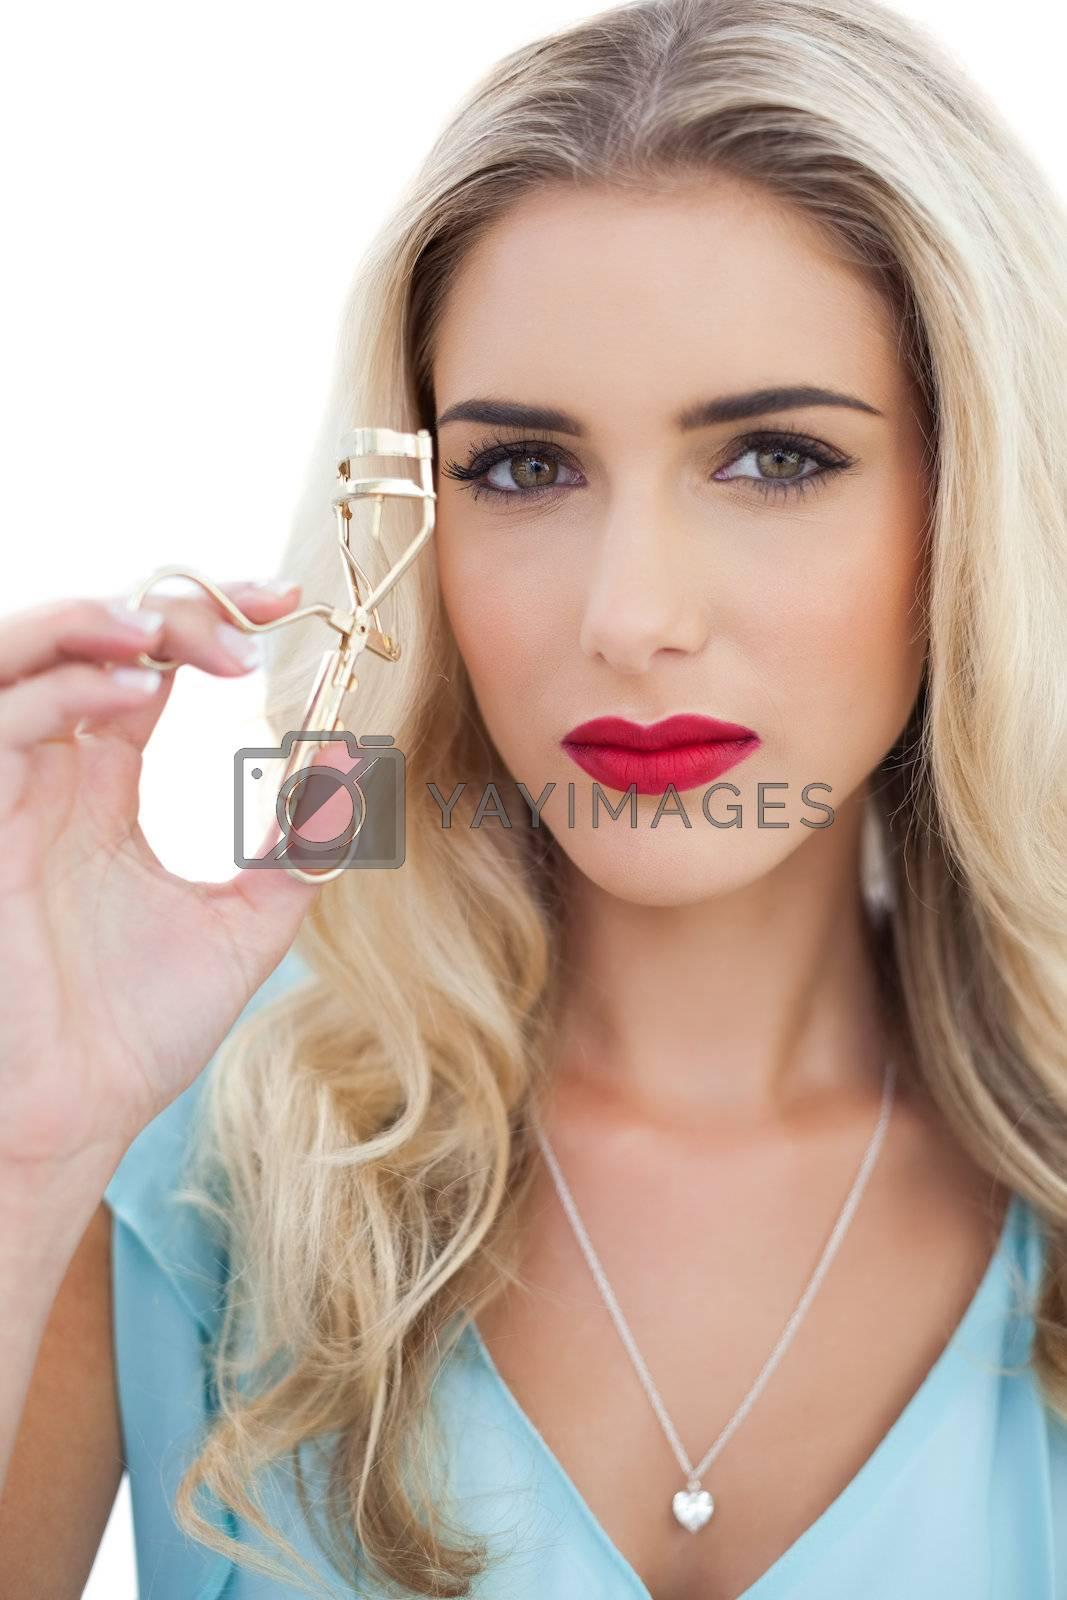 Serious blonde model in blue dress holding a eyelash curler by Wavebreakmedia